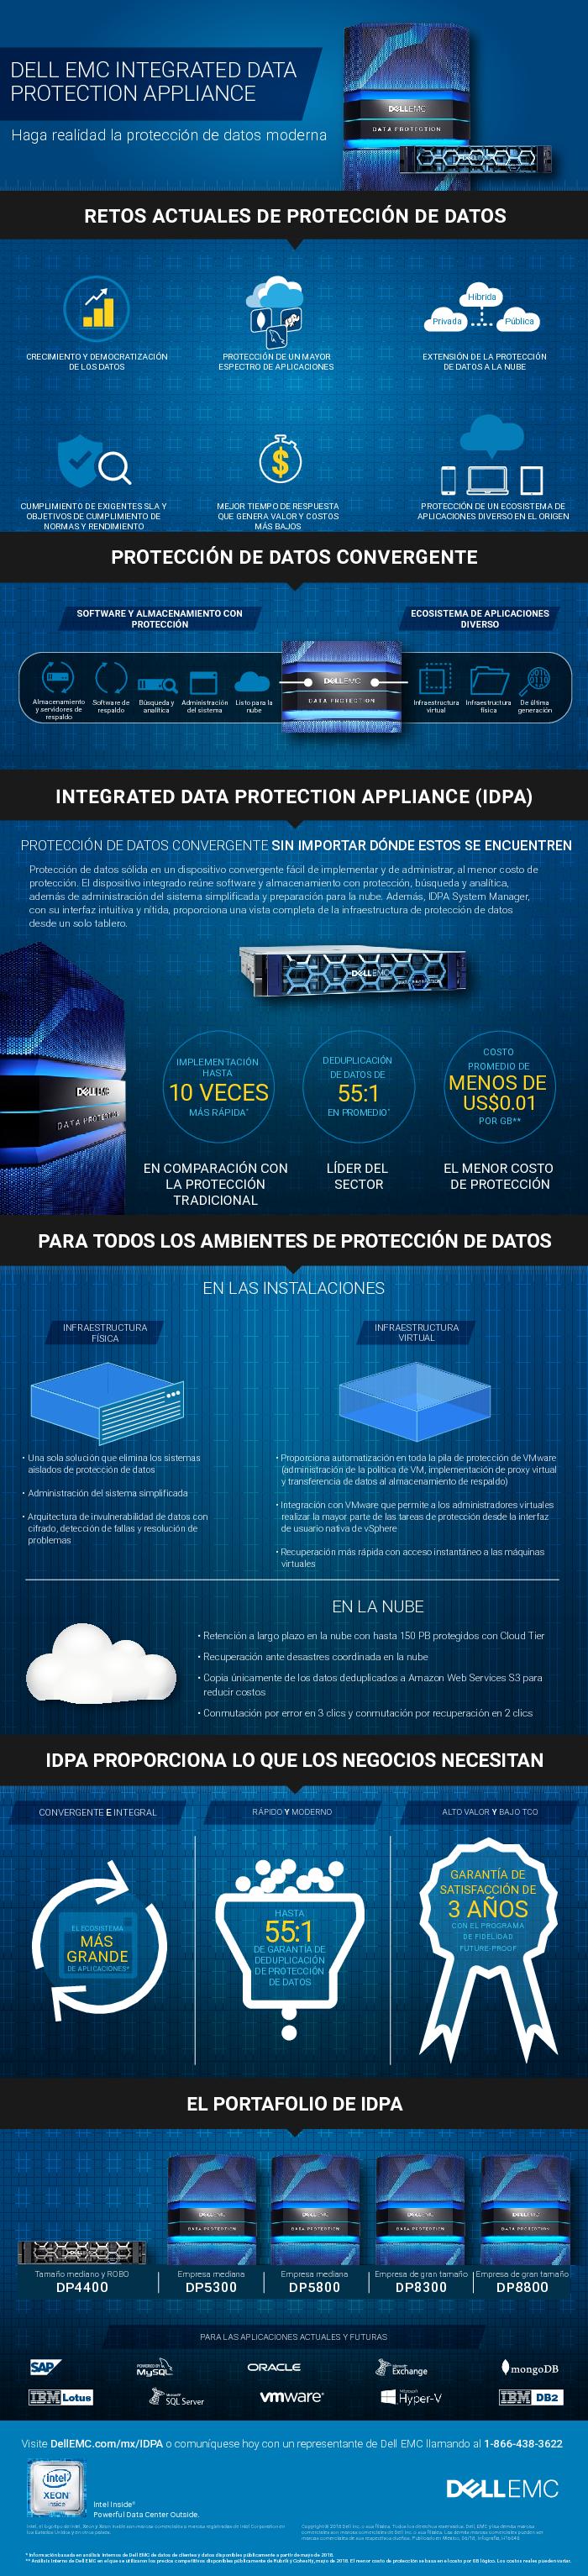 Thumb original infographic idpa realize modern data protection